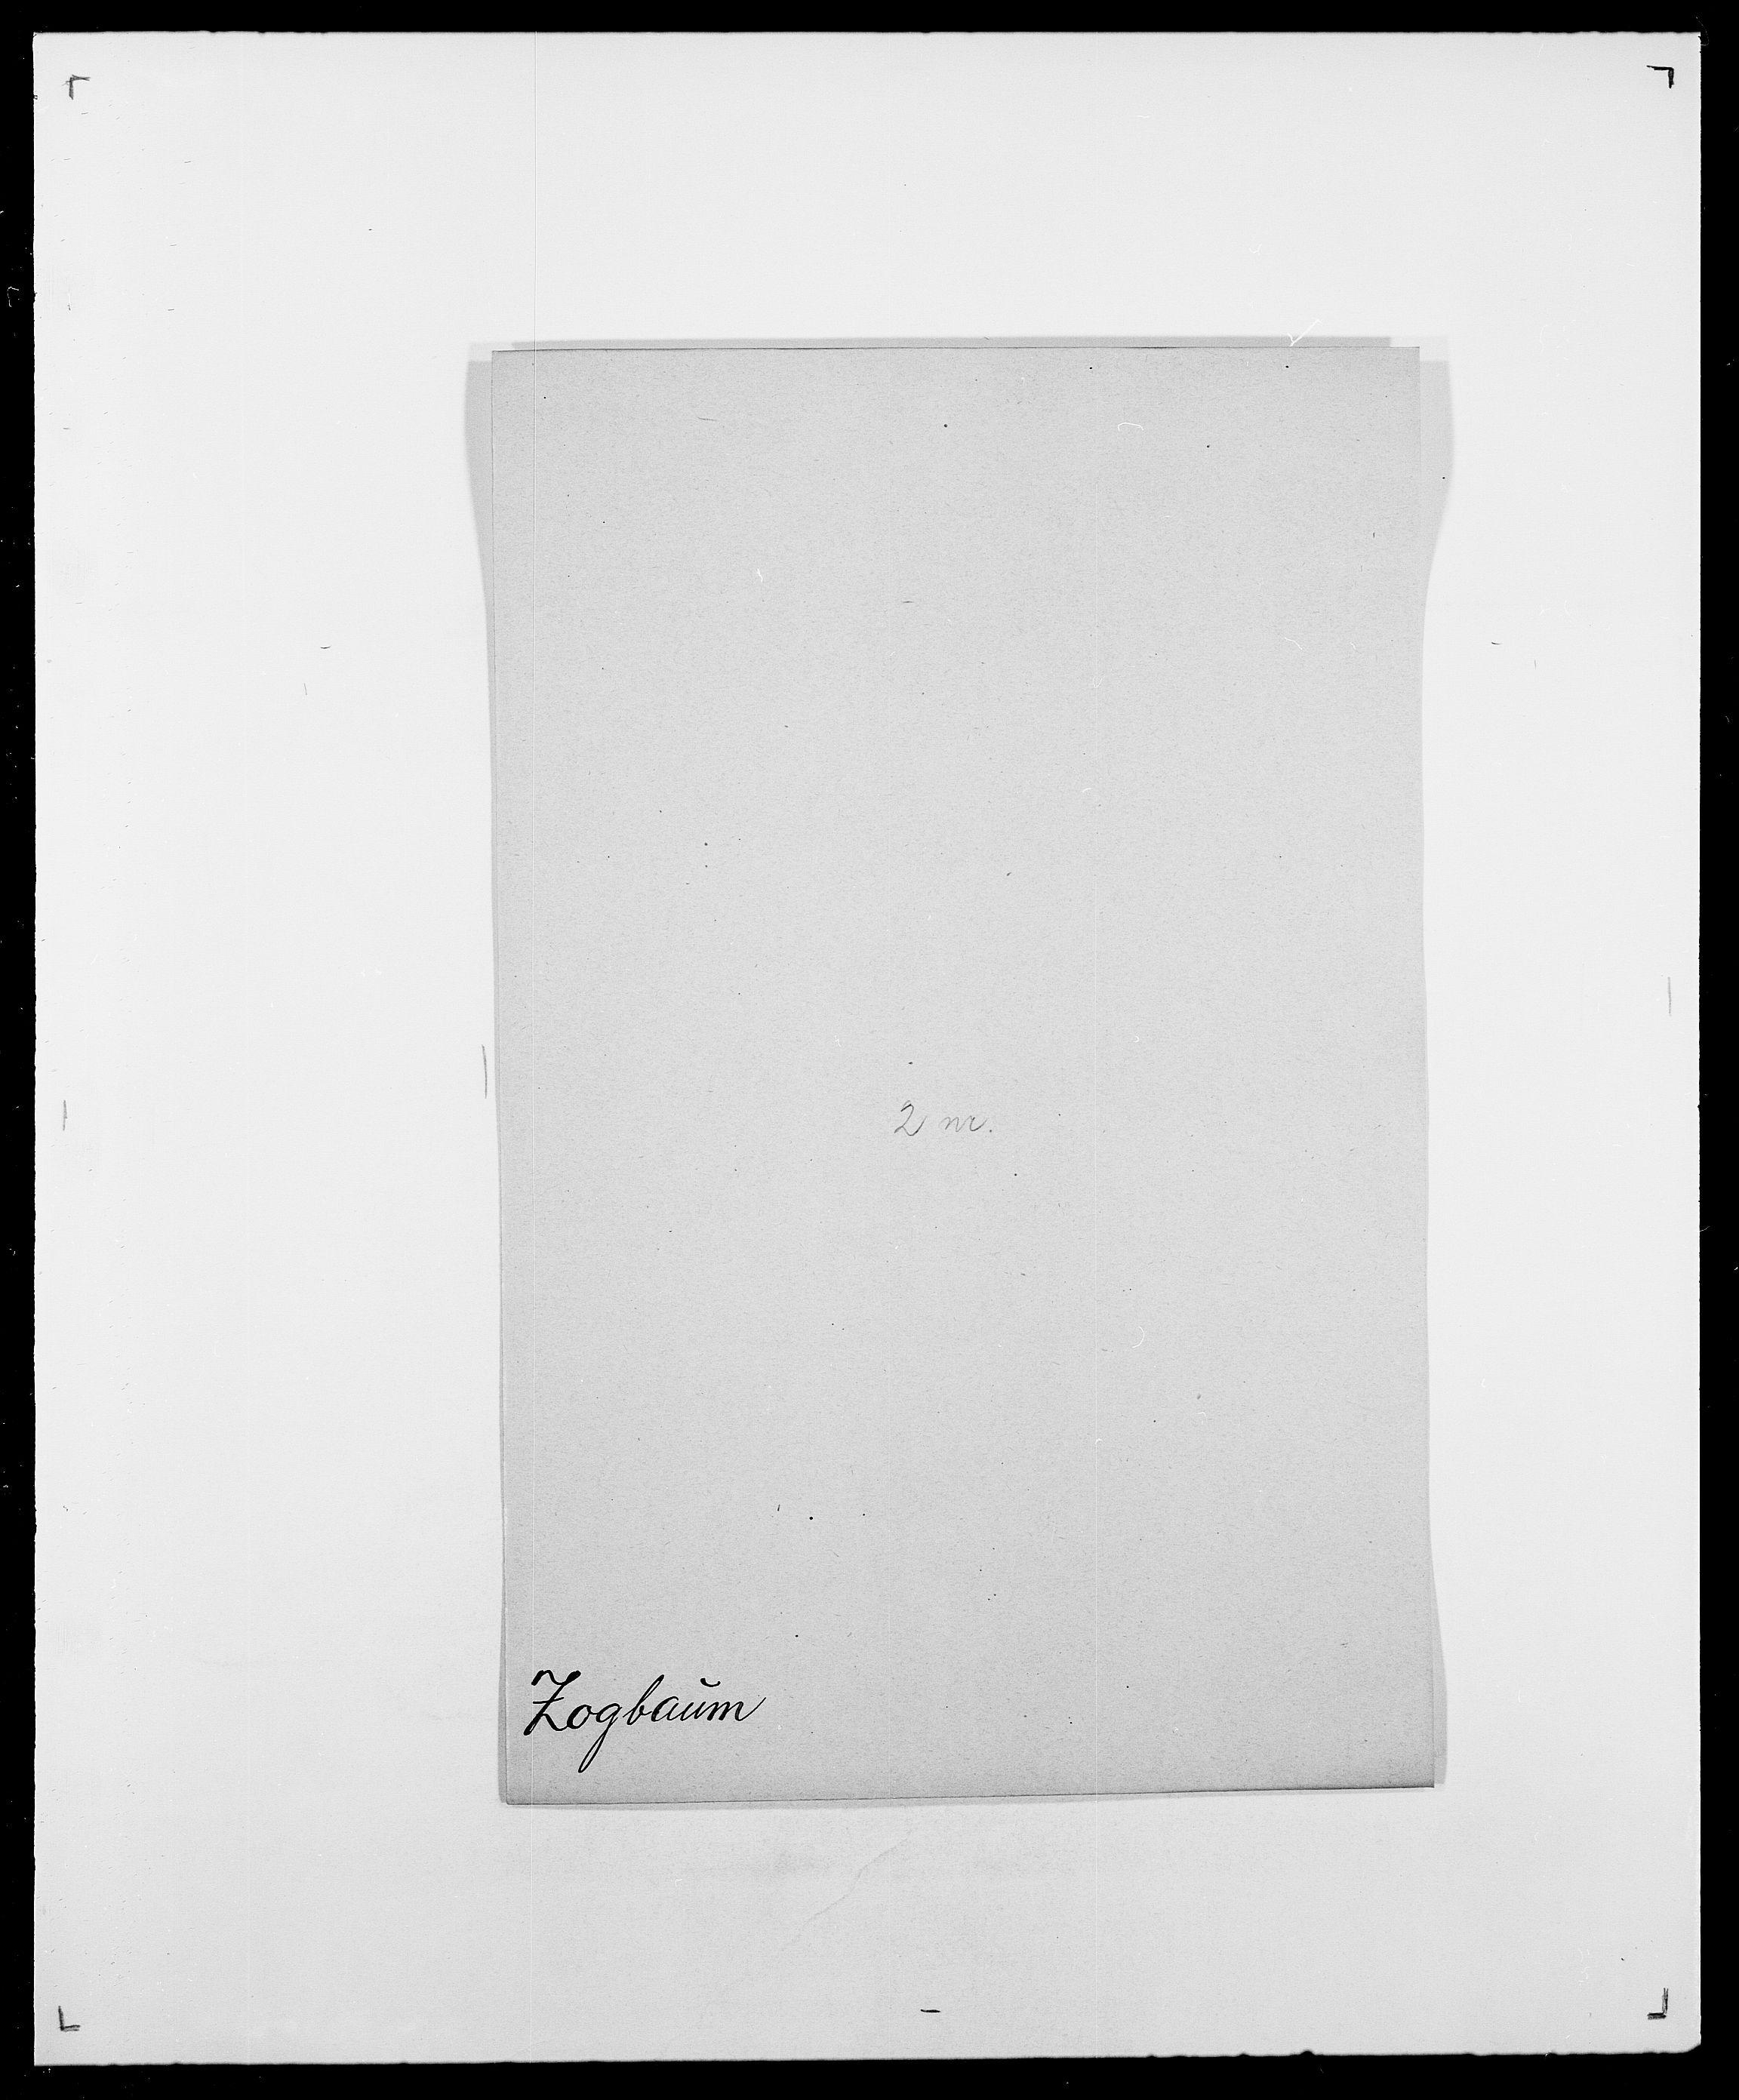 SAO, Delgobe, Charles Antoine - samling, D/Da/L0043: Wulfsberg - v. Zanten, s. 206